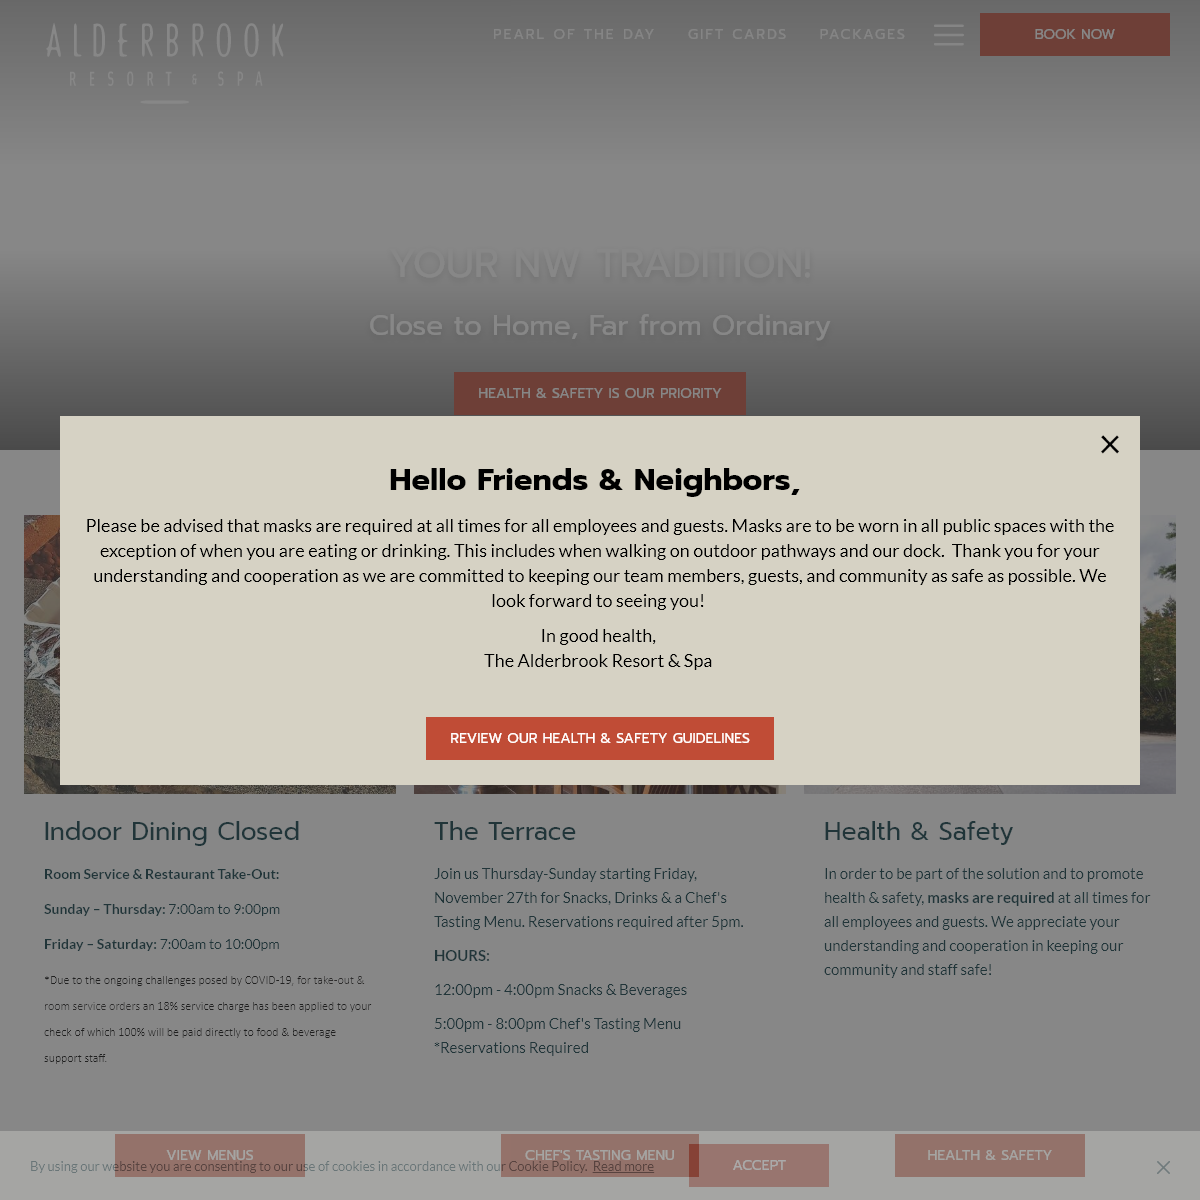 Alderbrook Resort & Spa - Washington State Luxury Resort